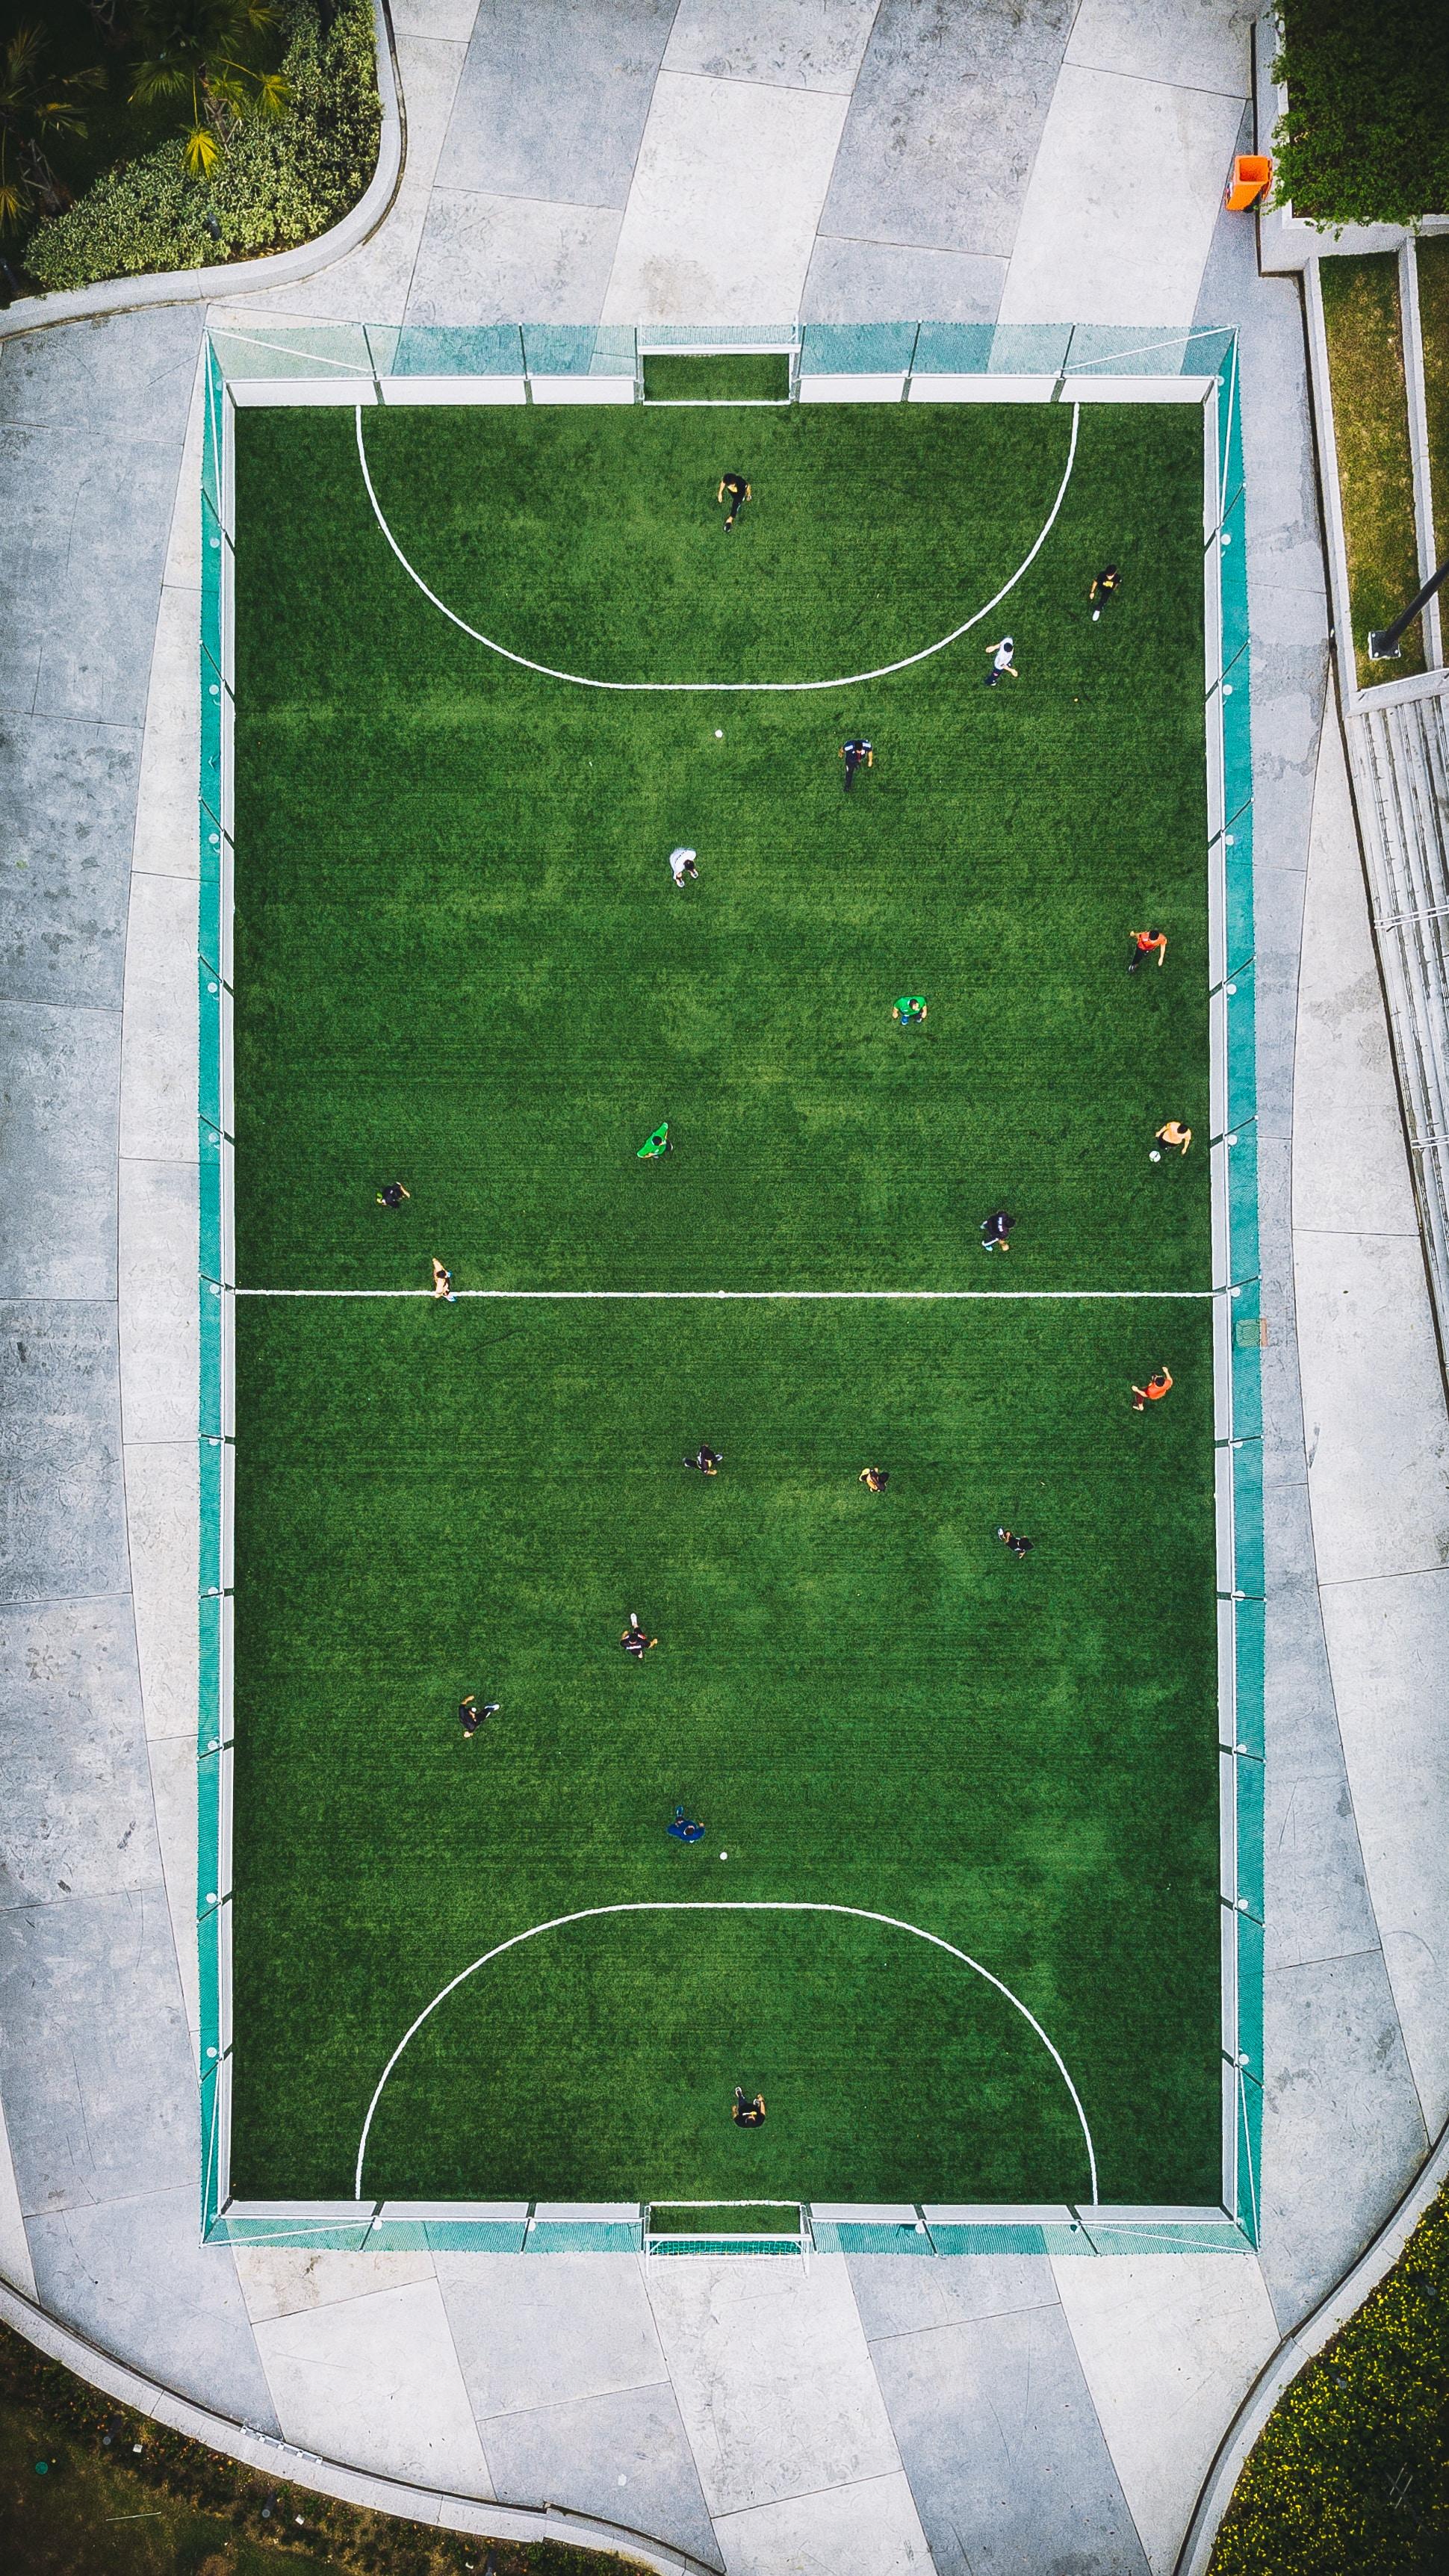 futsal court  bukit jalil  kuala lumpur photo by izuddin helmi adnan   izuddinhelmi  on unsplash